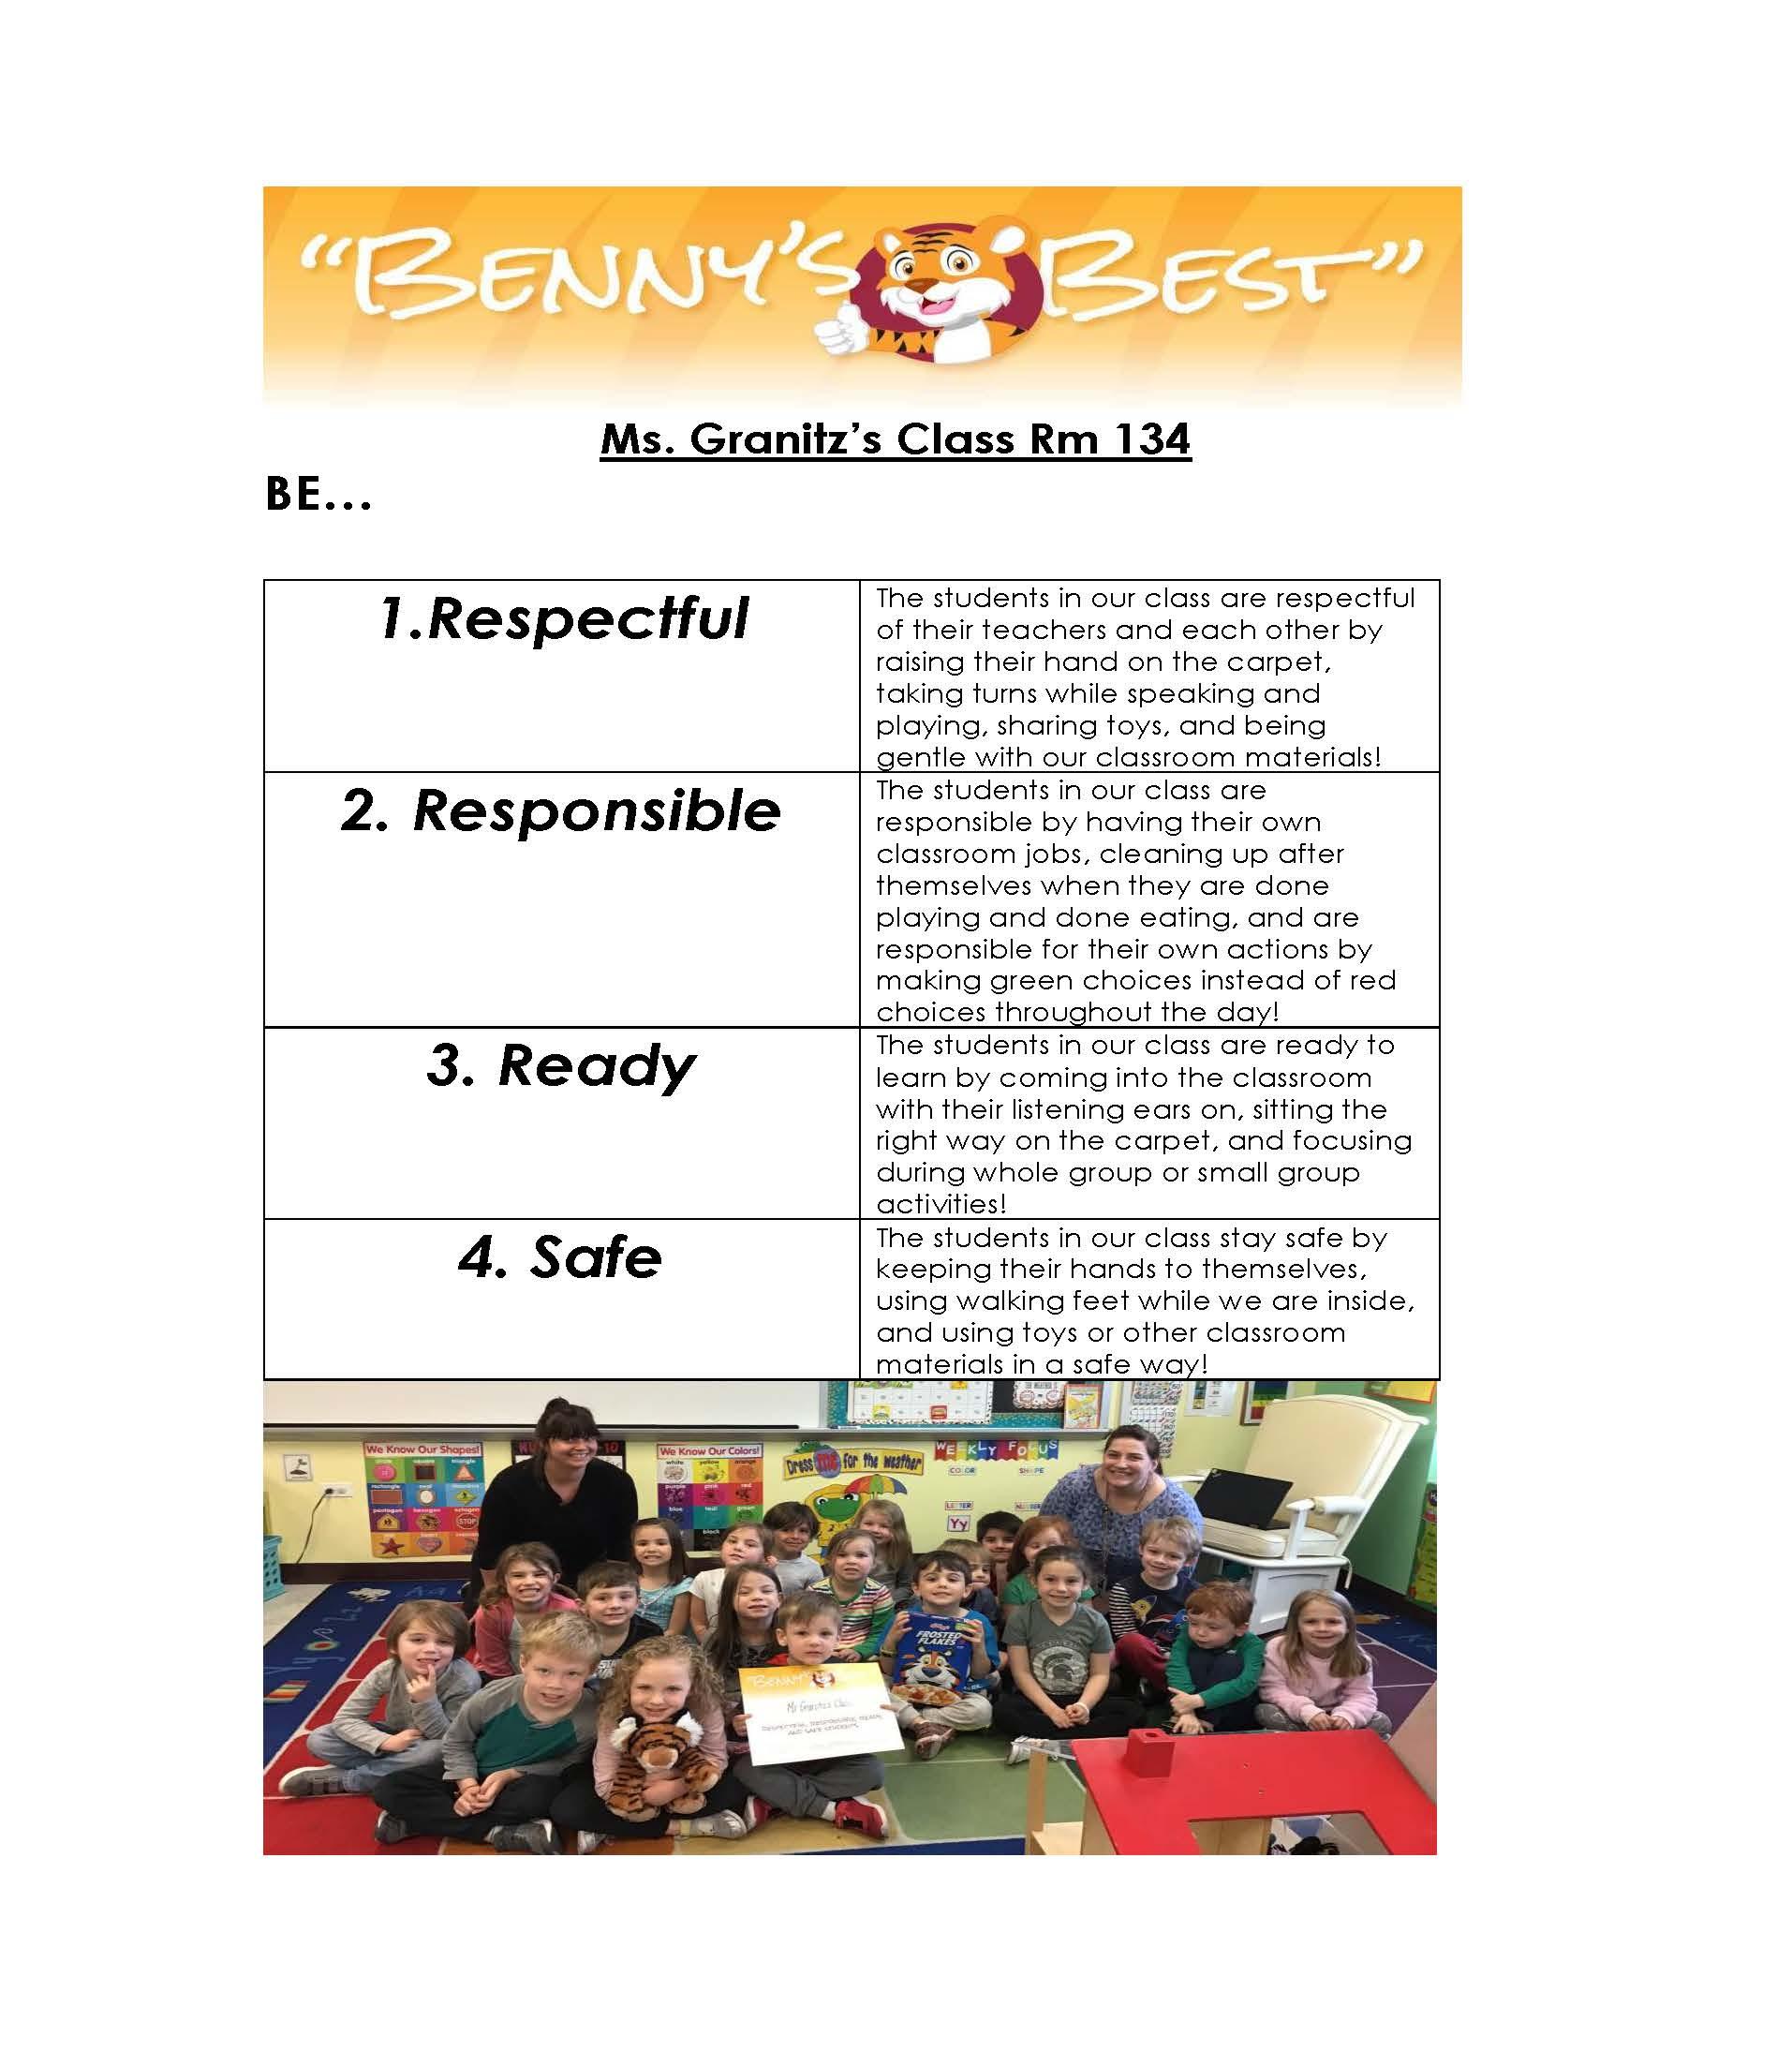 Ms. Granitz--Benny's Best.jpg